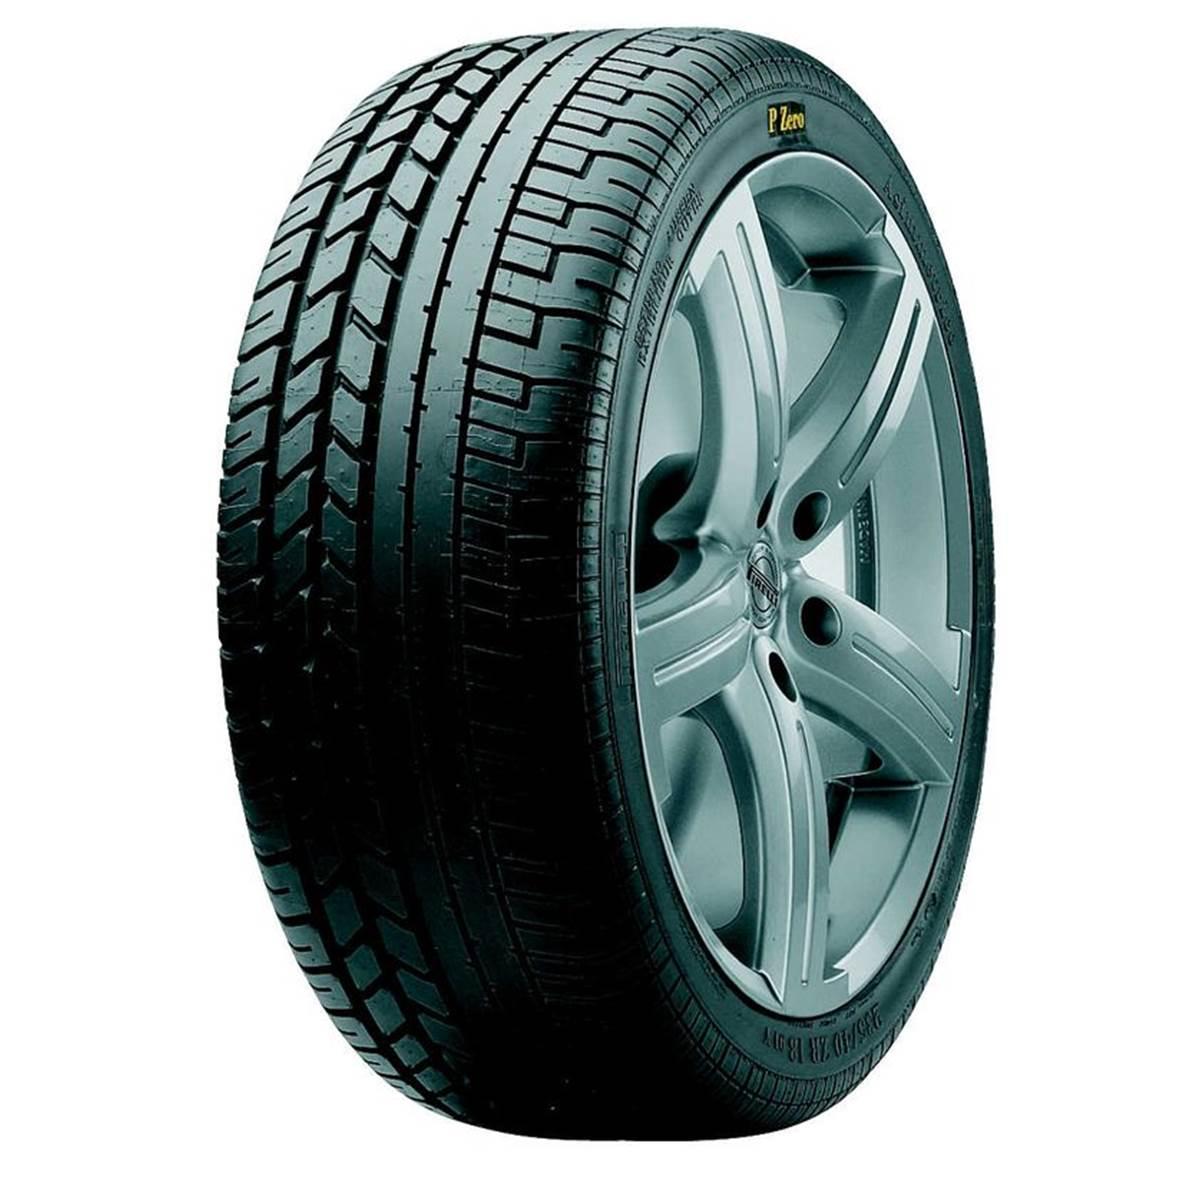 Pneu Pirelli 255/45R18 99Y Pzero Asimmetrico